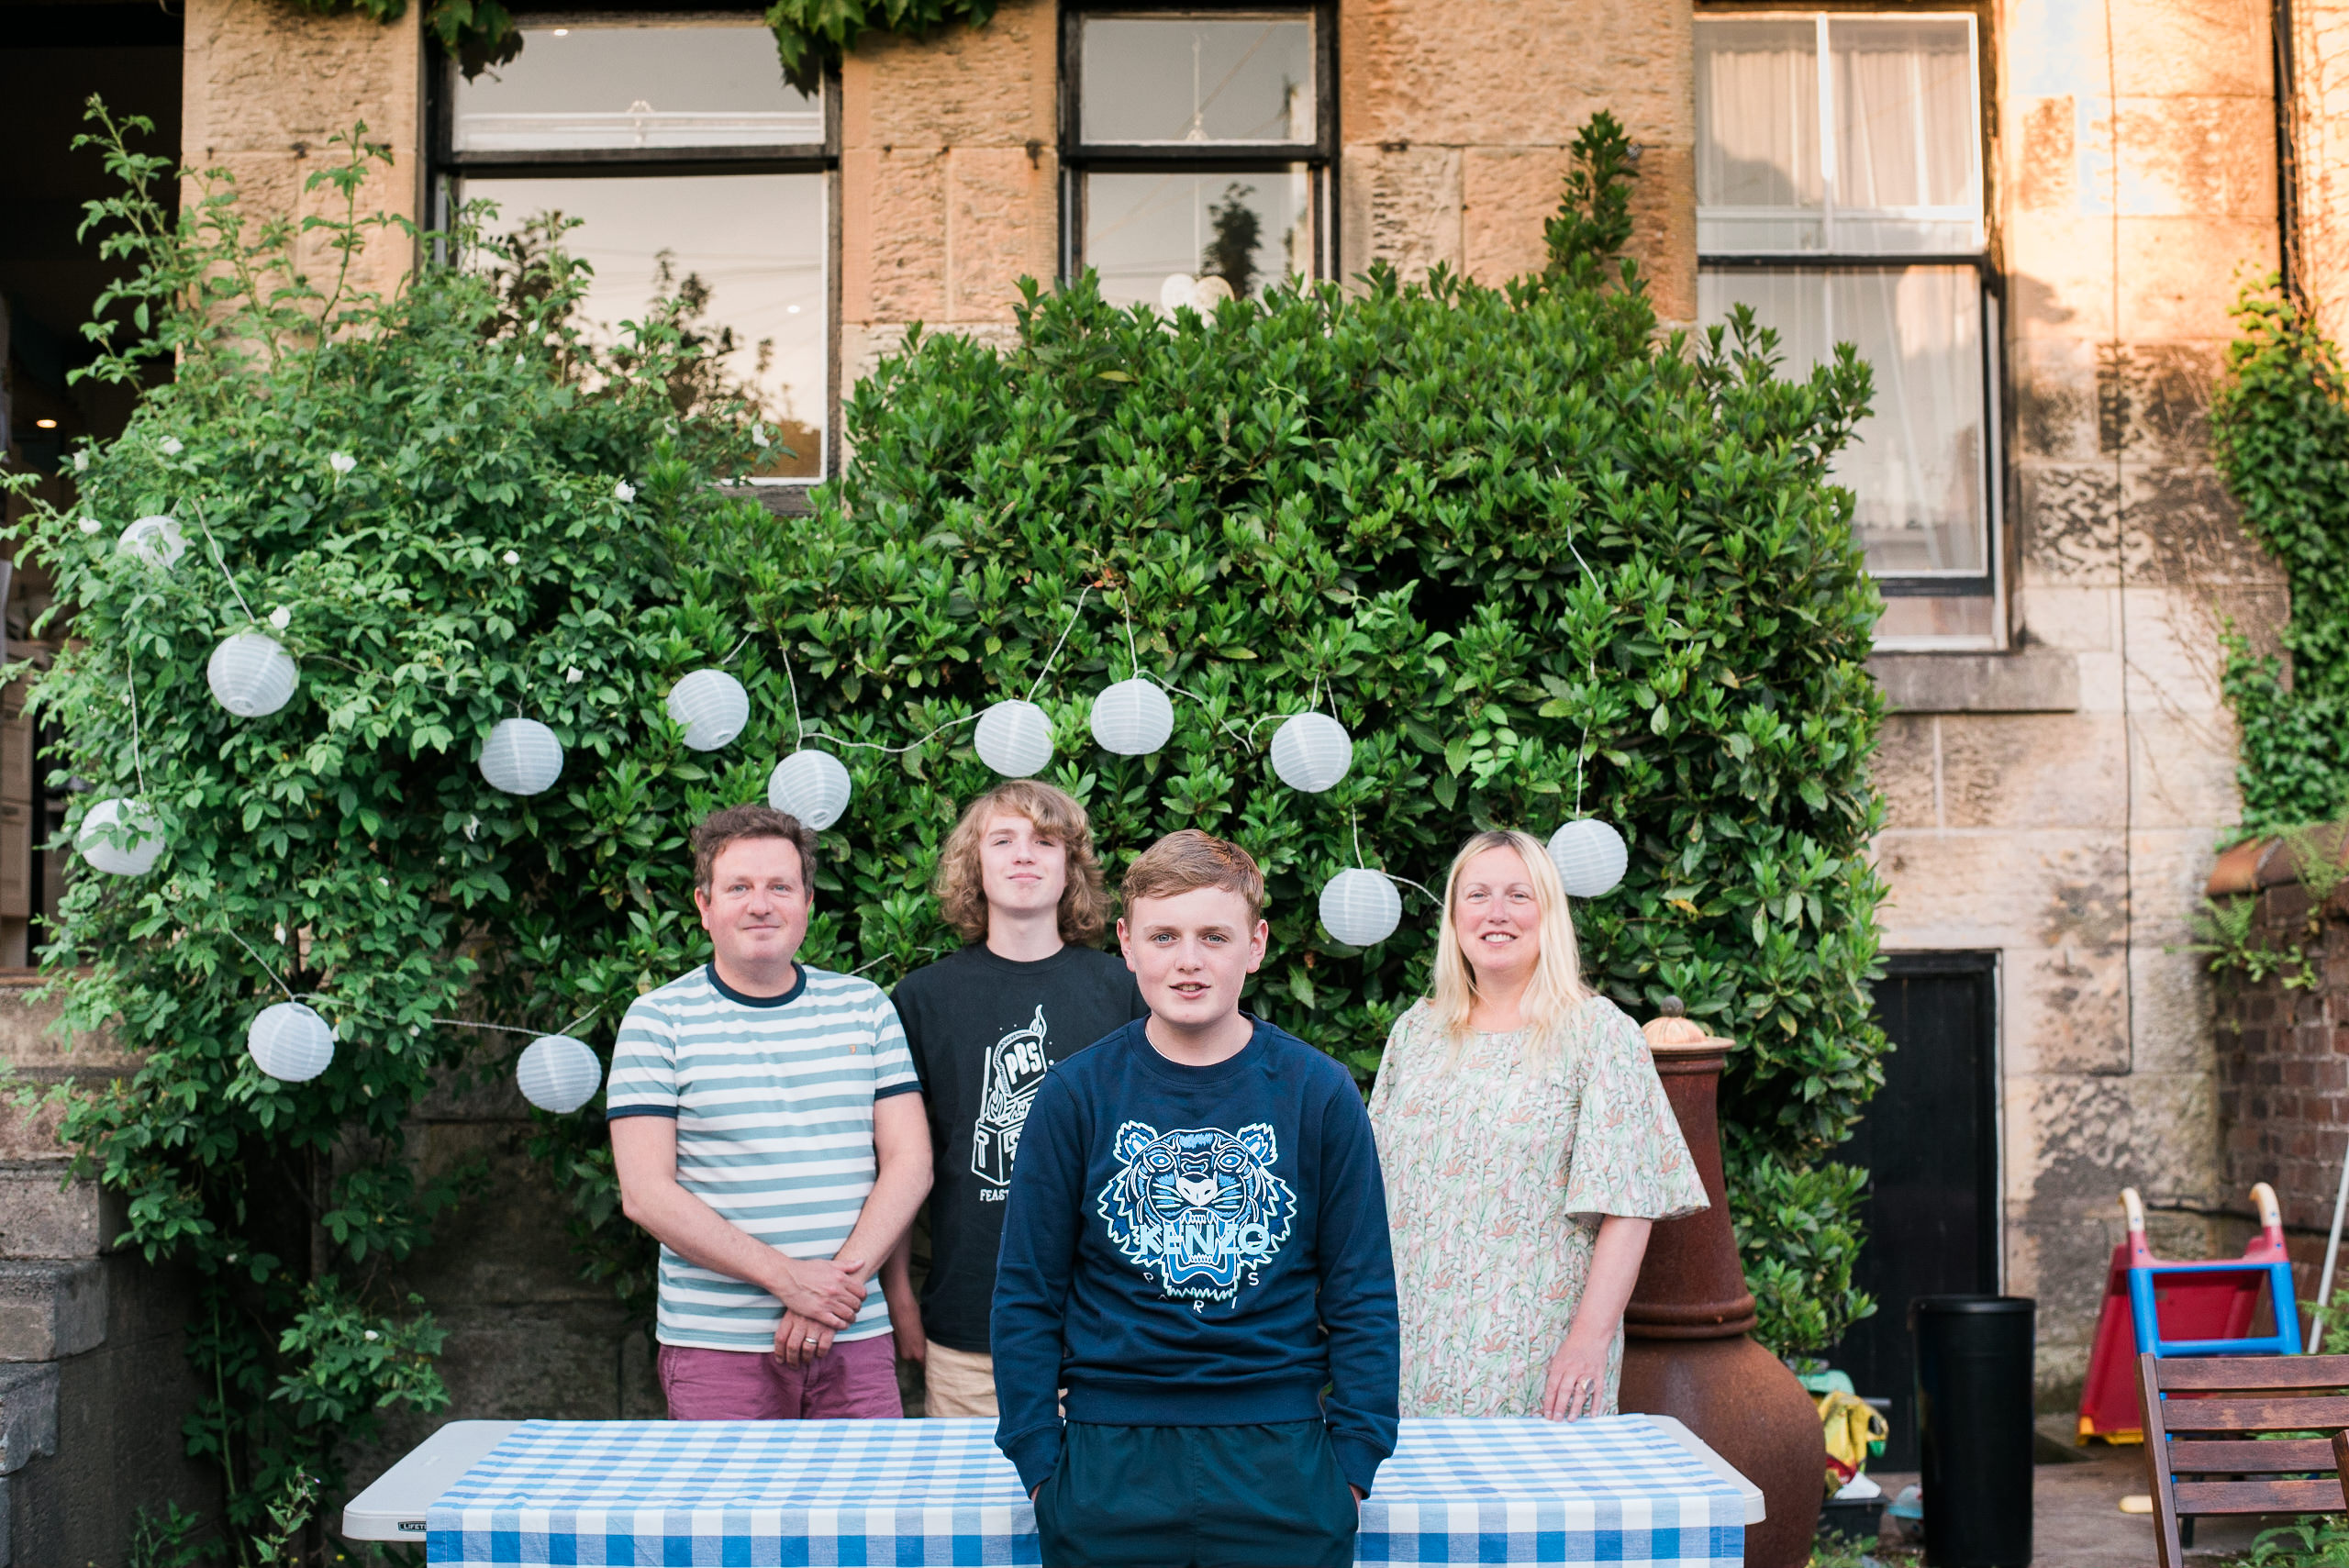 Family Portraits Glasgow, Glasgow Doorstep Portraits, Informal Family Photos Glasgow